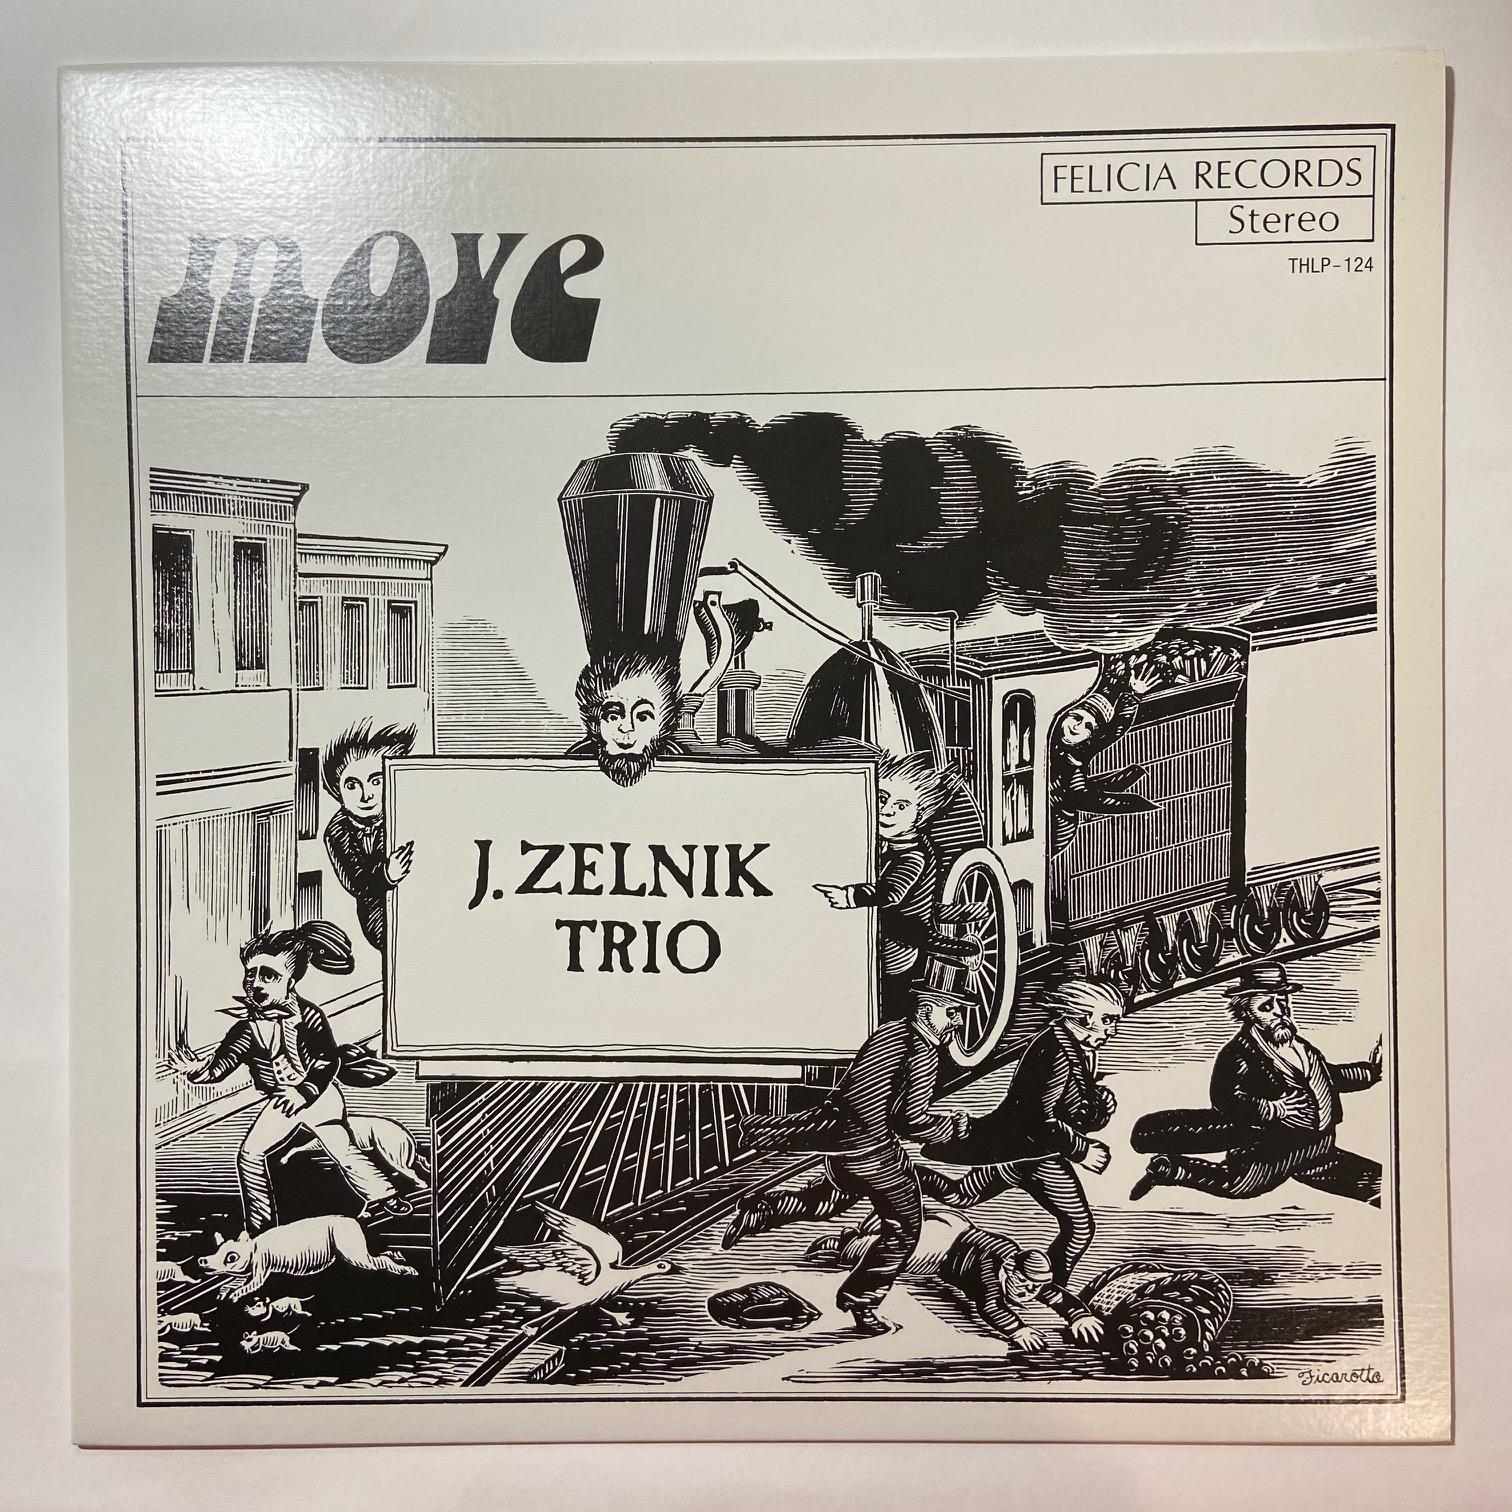 J. ZELNIK TRIO - Move - LP